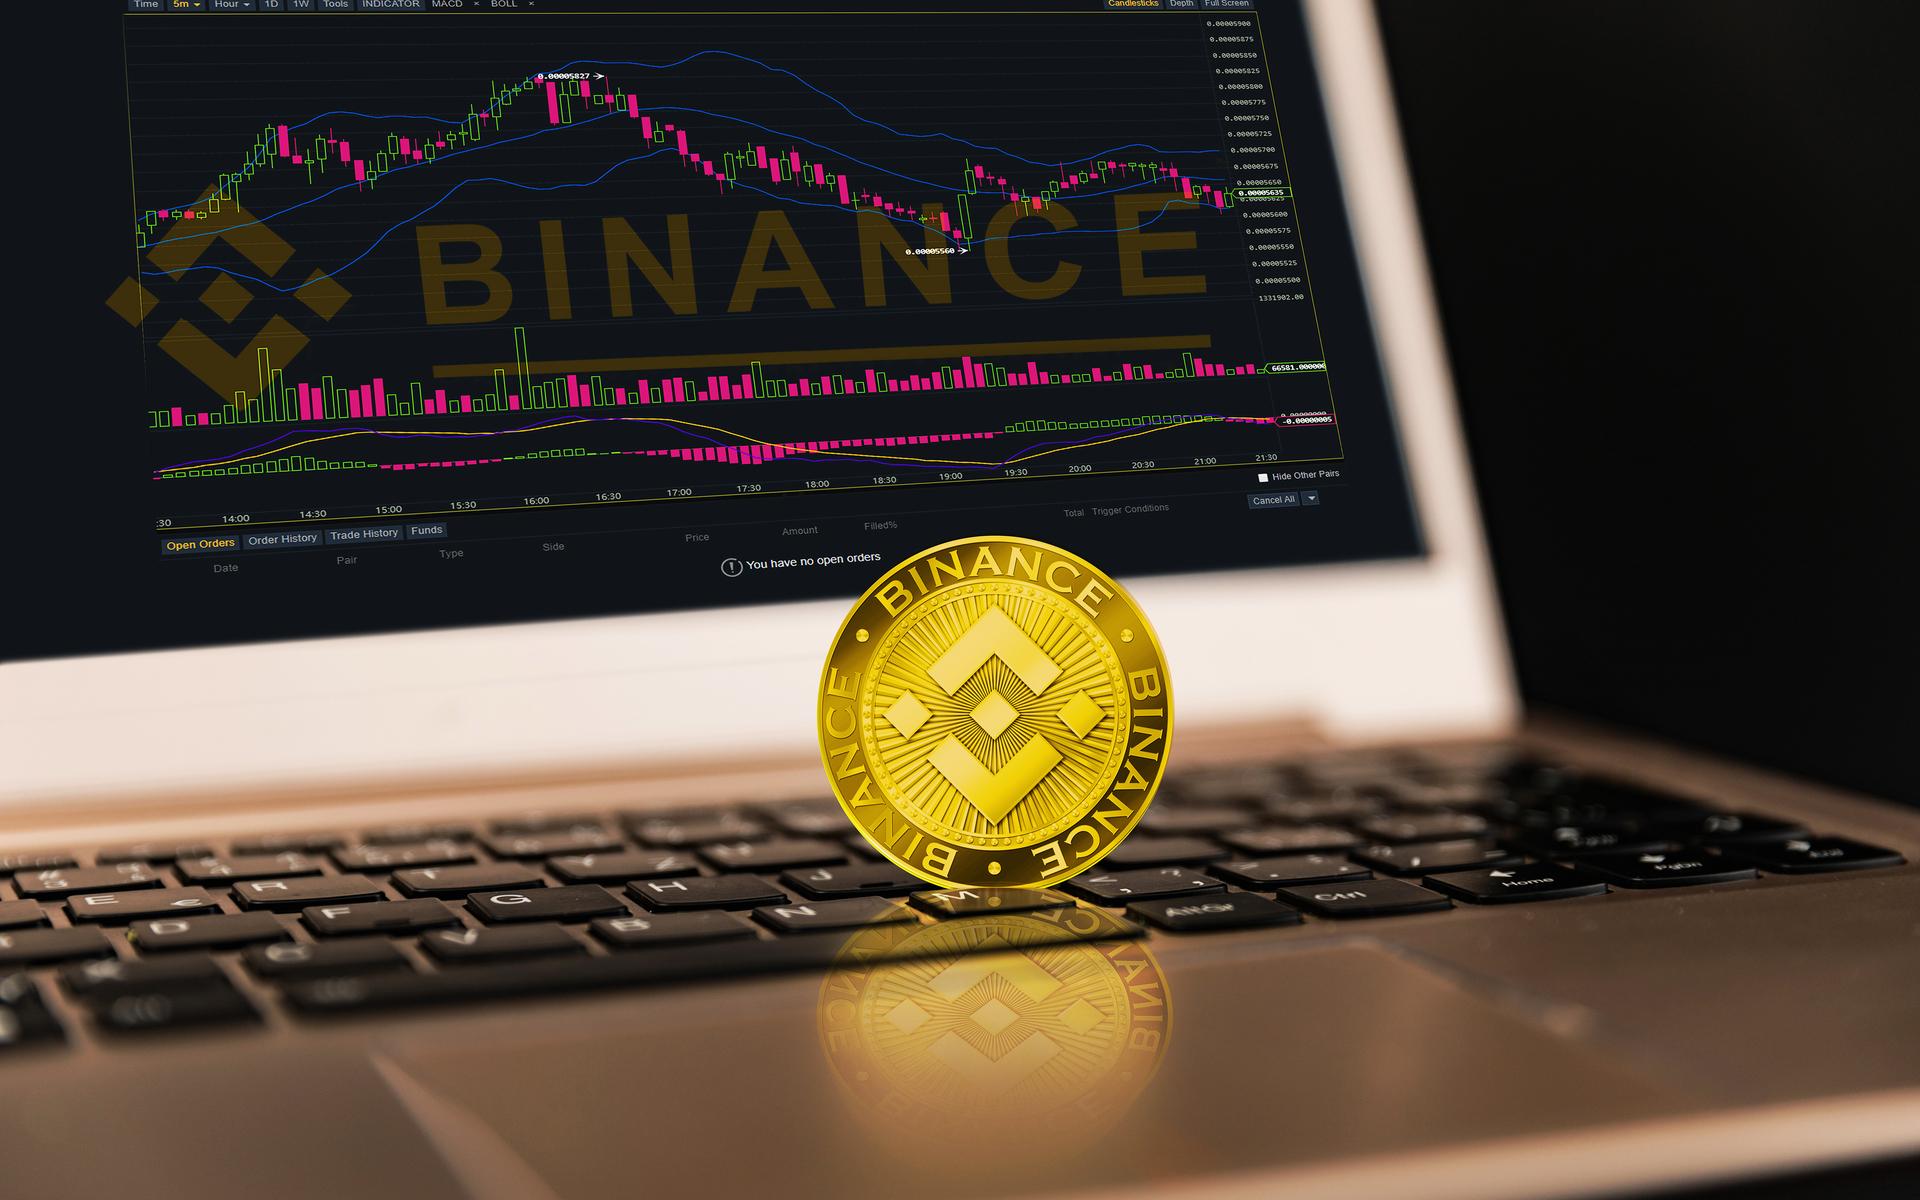 Iota price on binance